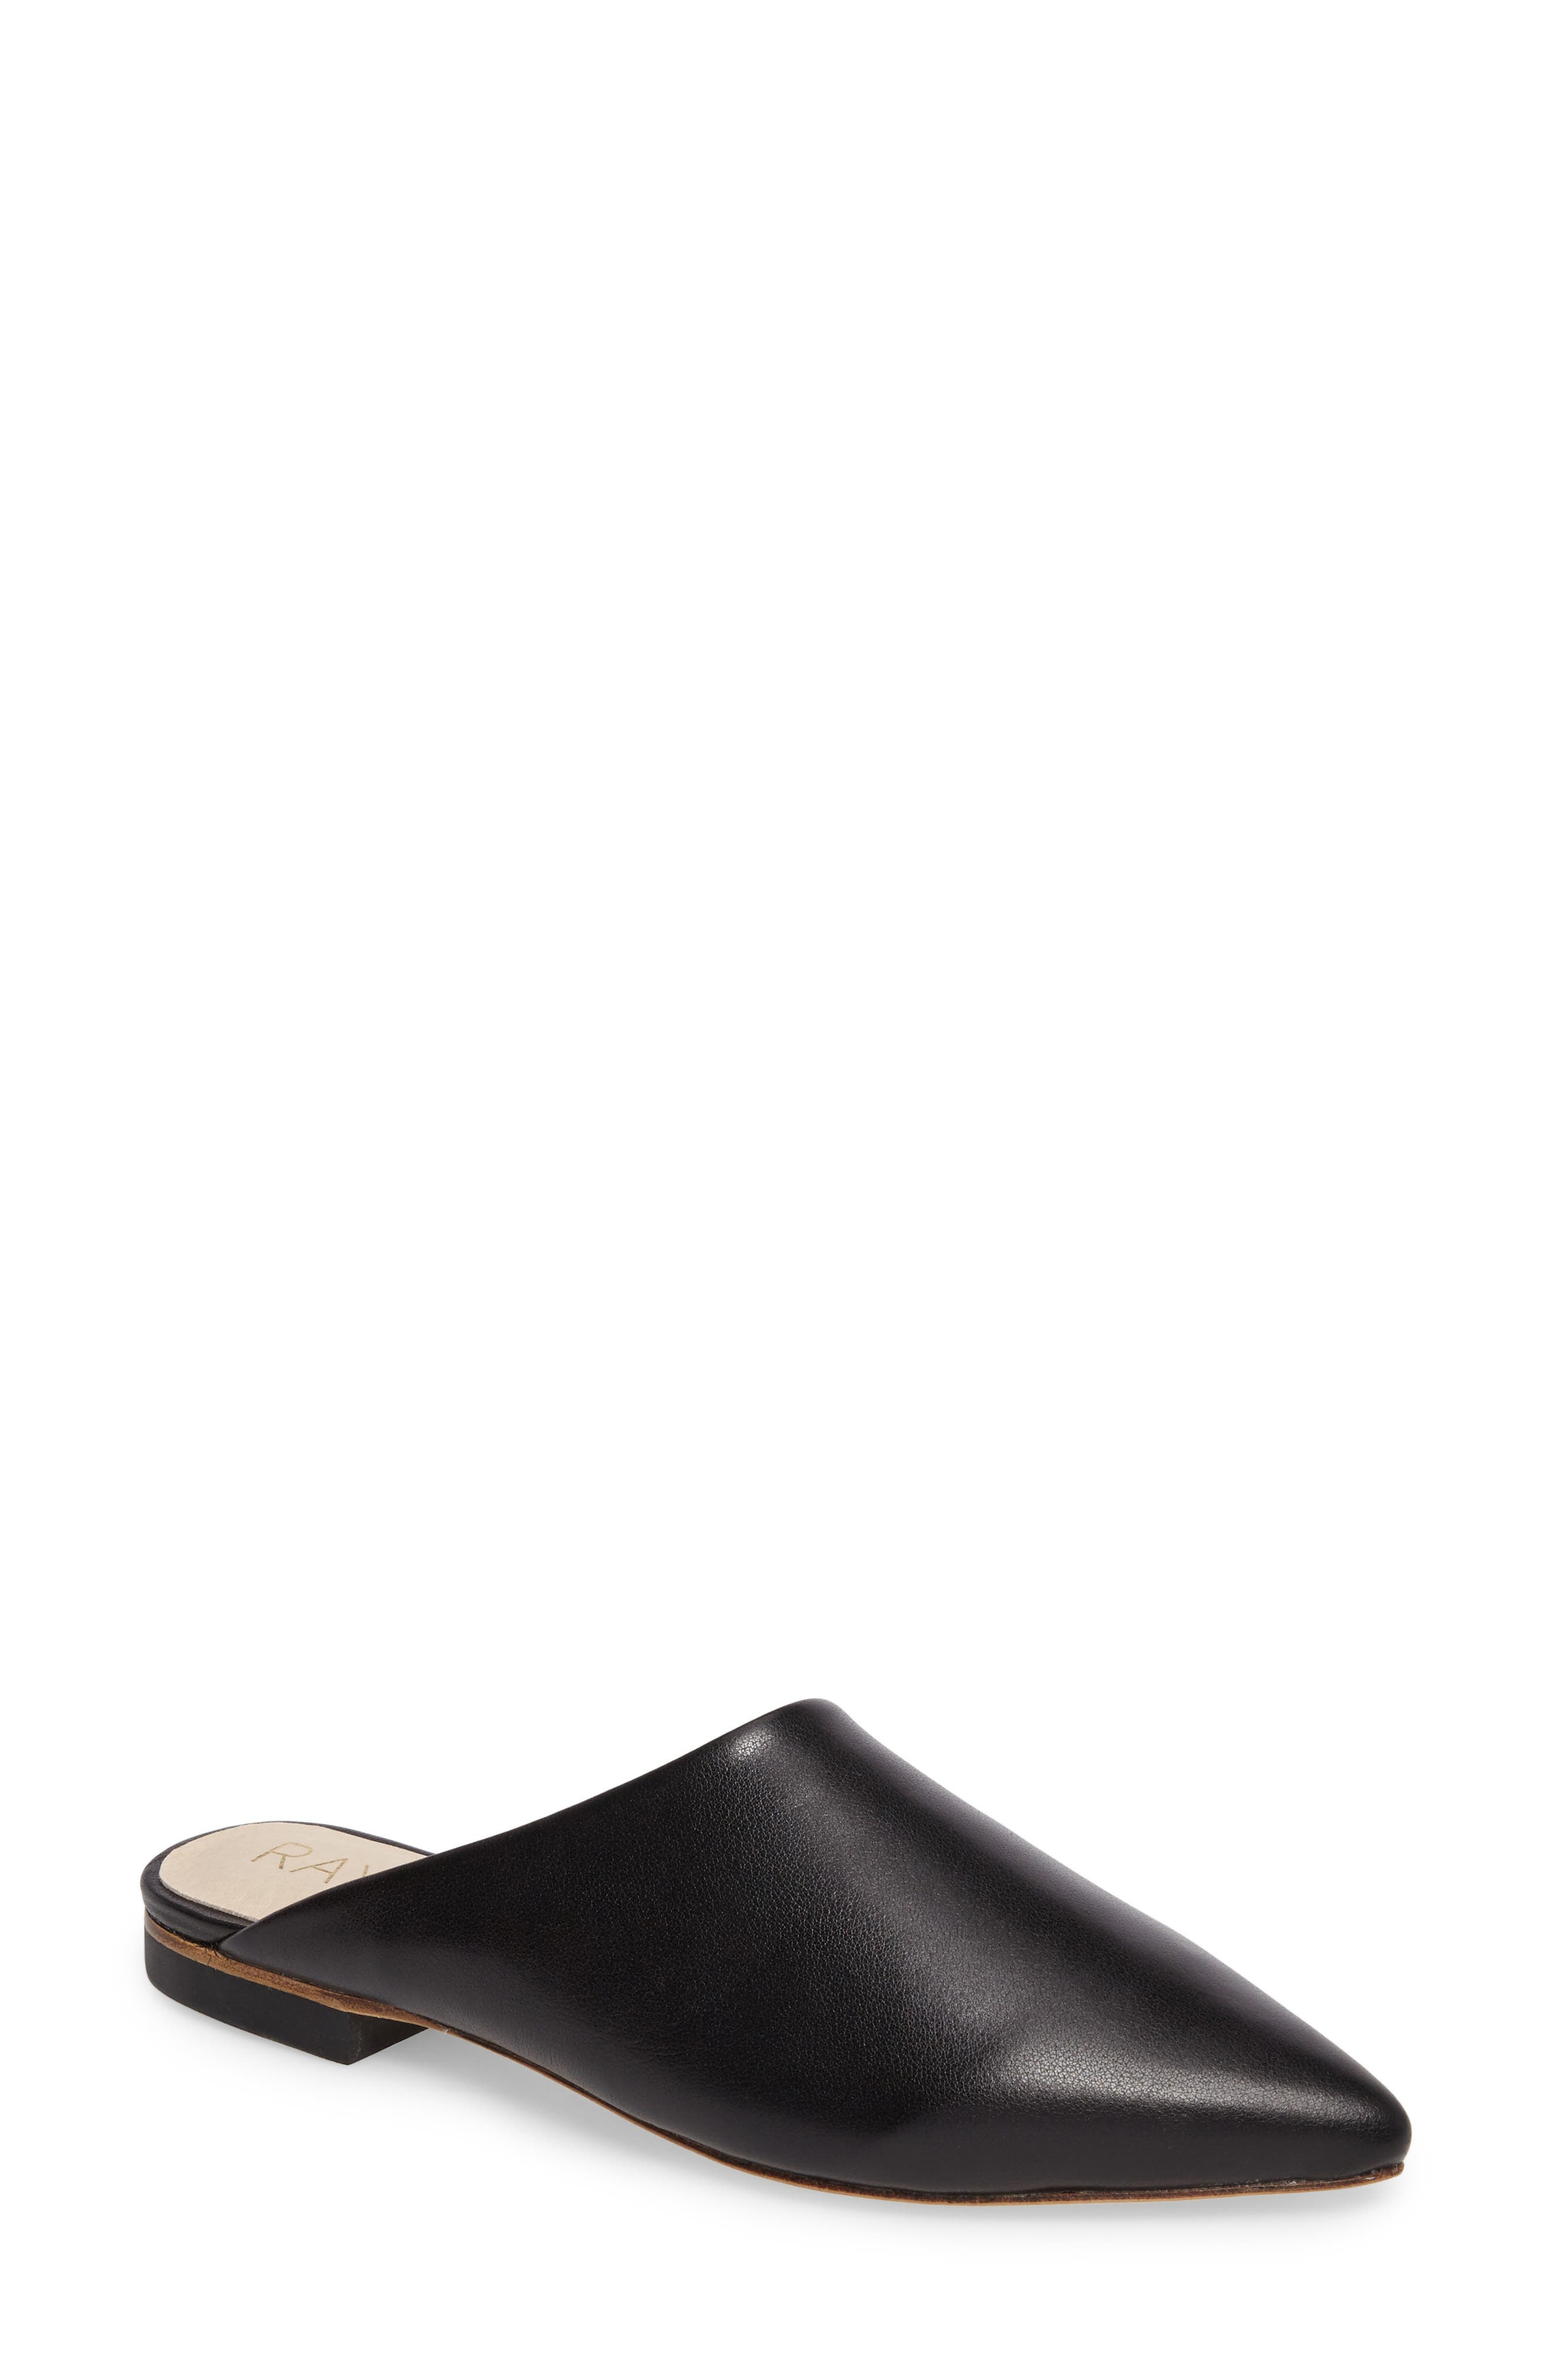 Starlet Mule,                             Main thumbnail 1, color,                             Black Leather